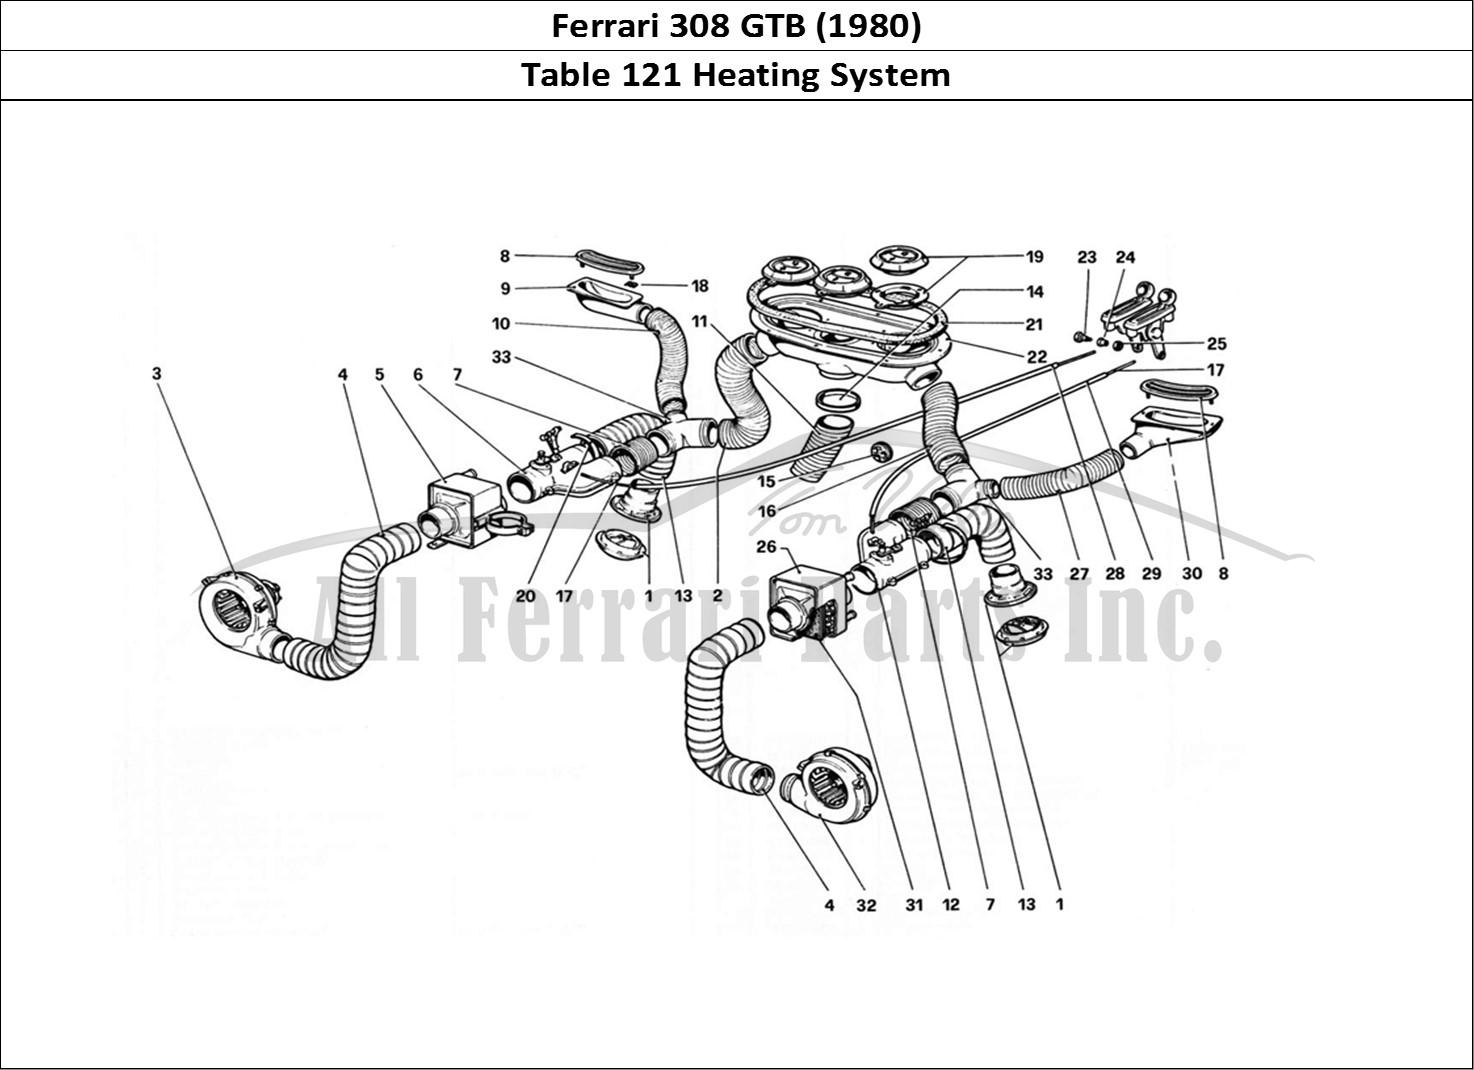 Buy original Ferrari 308 GTB (1980) 121 Heating System